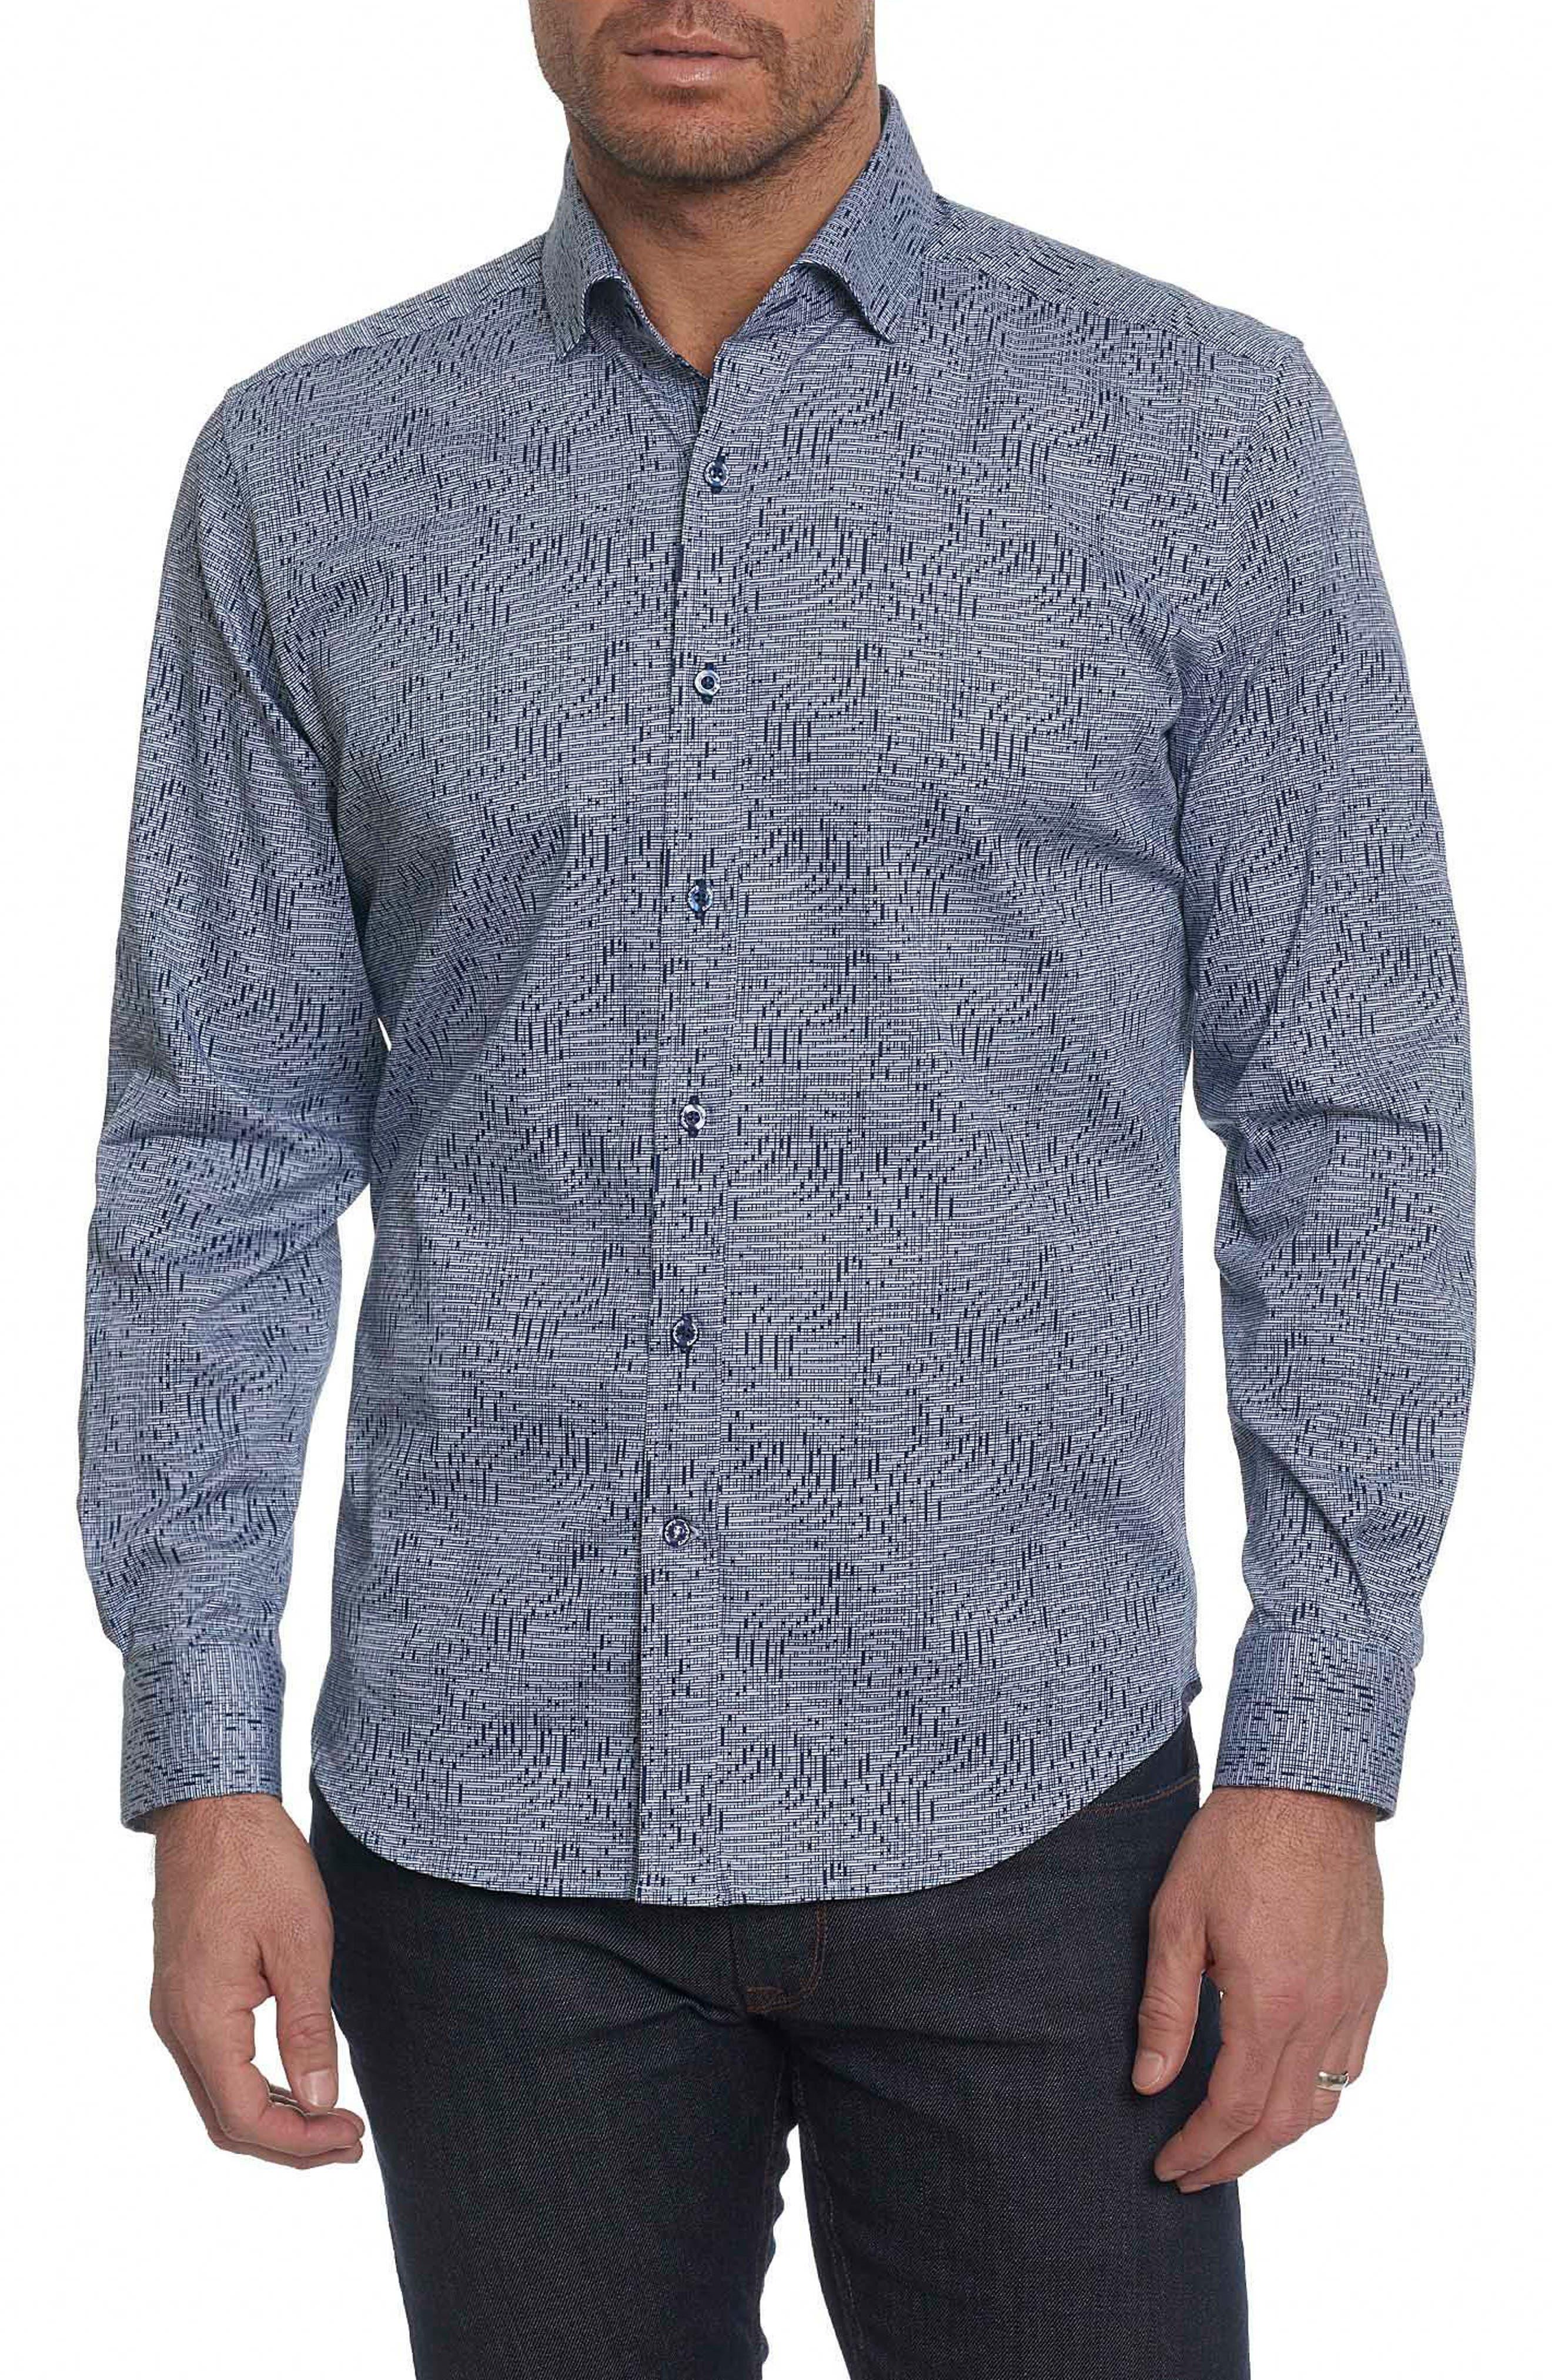 Donovan Tailored Fit Sport Shirt,                         Main,                         color, 410